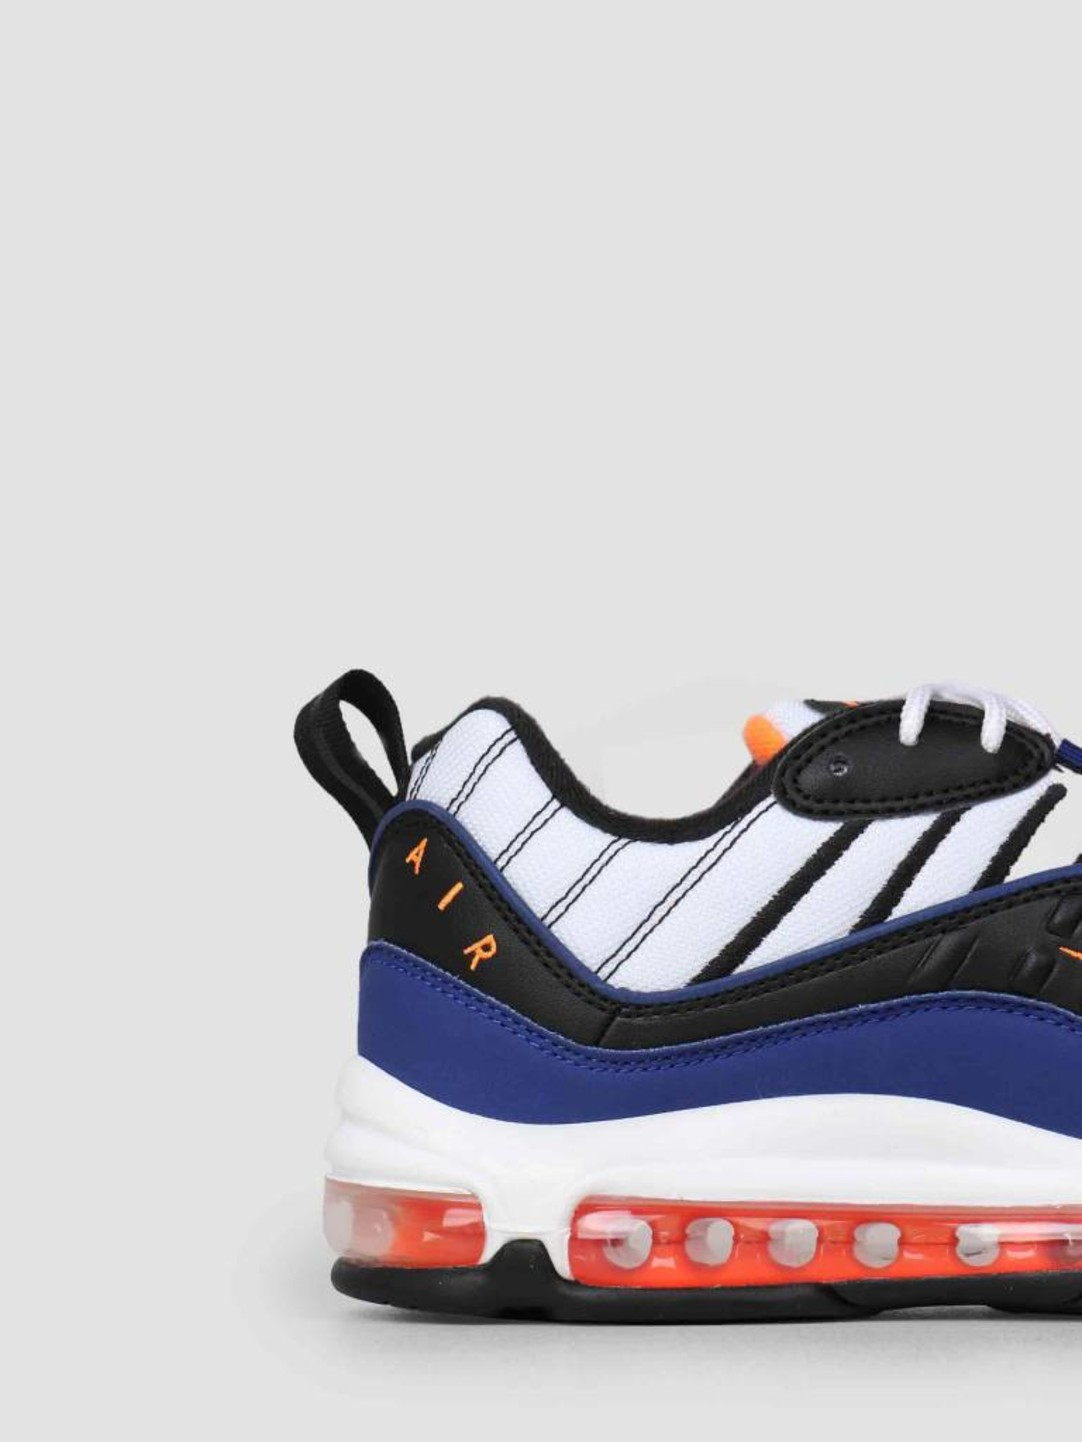 finest selection a2b79 ddd37 Nike Air Max 98 White Deep Royal Blue-Total Orange-Black Cd1536-100